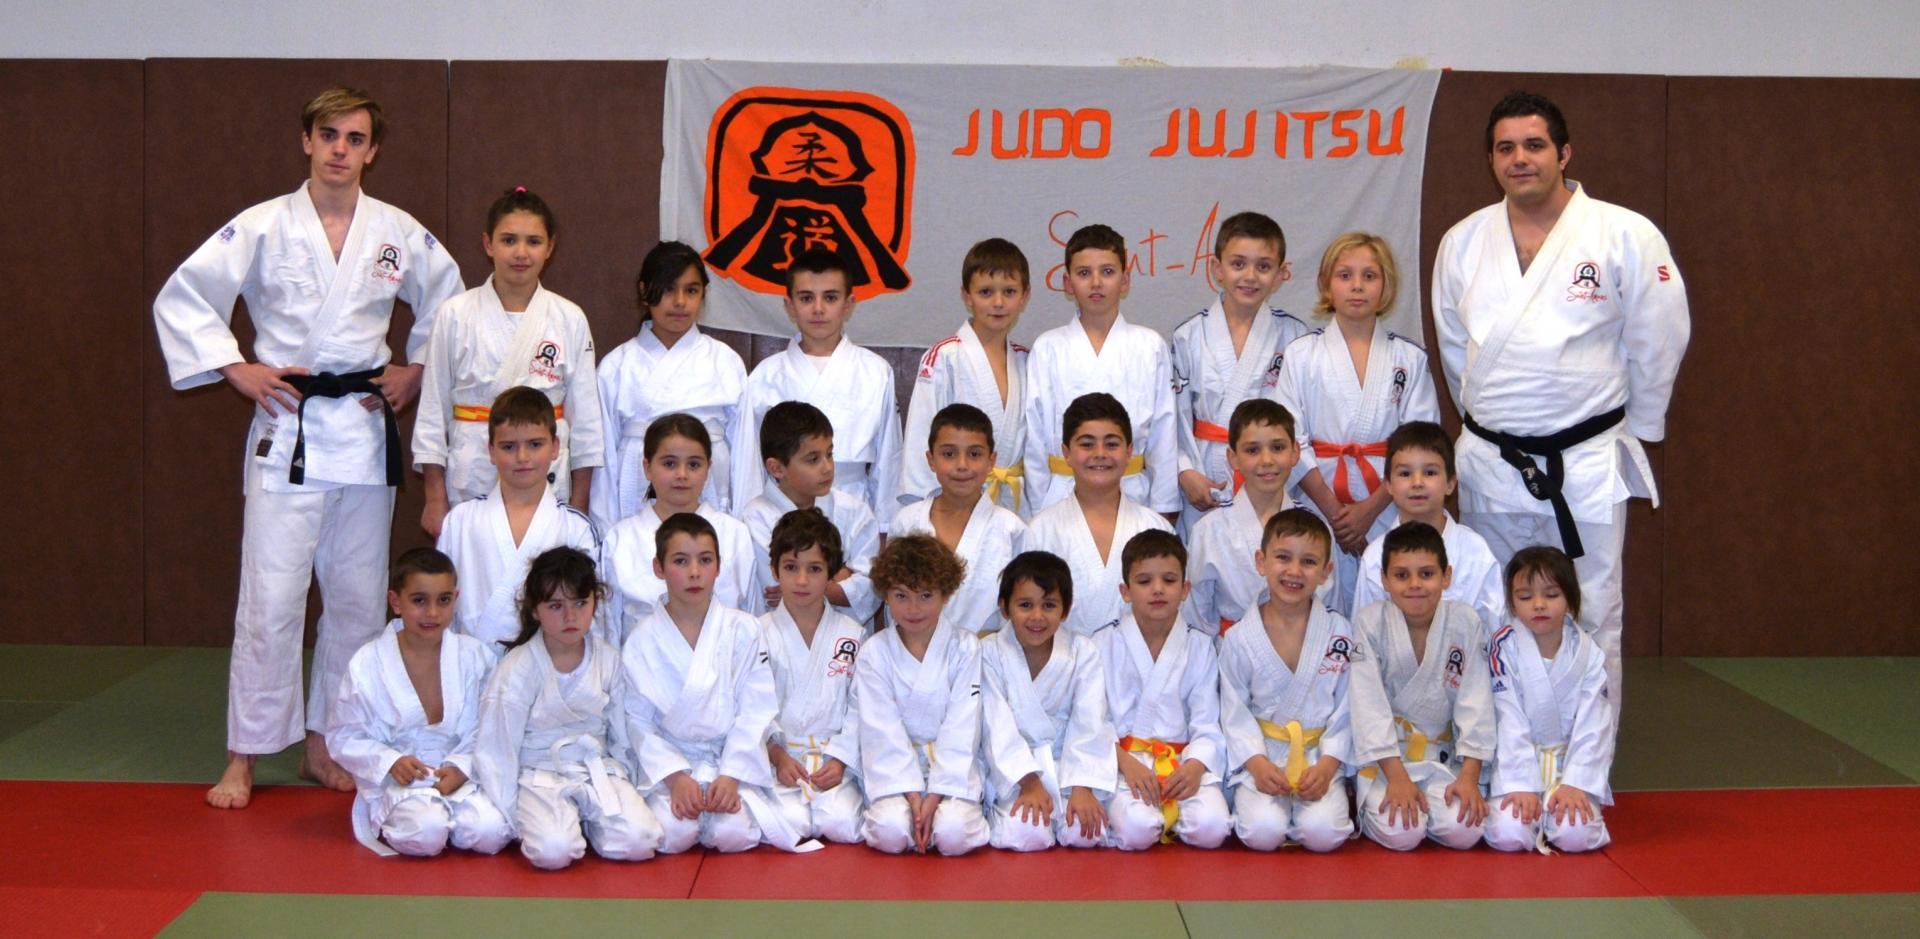 Groupe Judo Enfants (Novembre 2017)